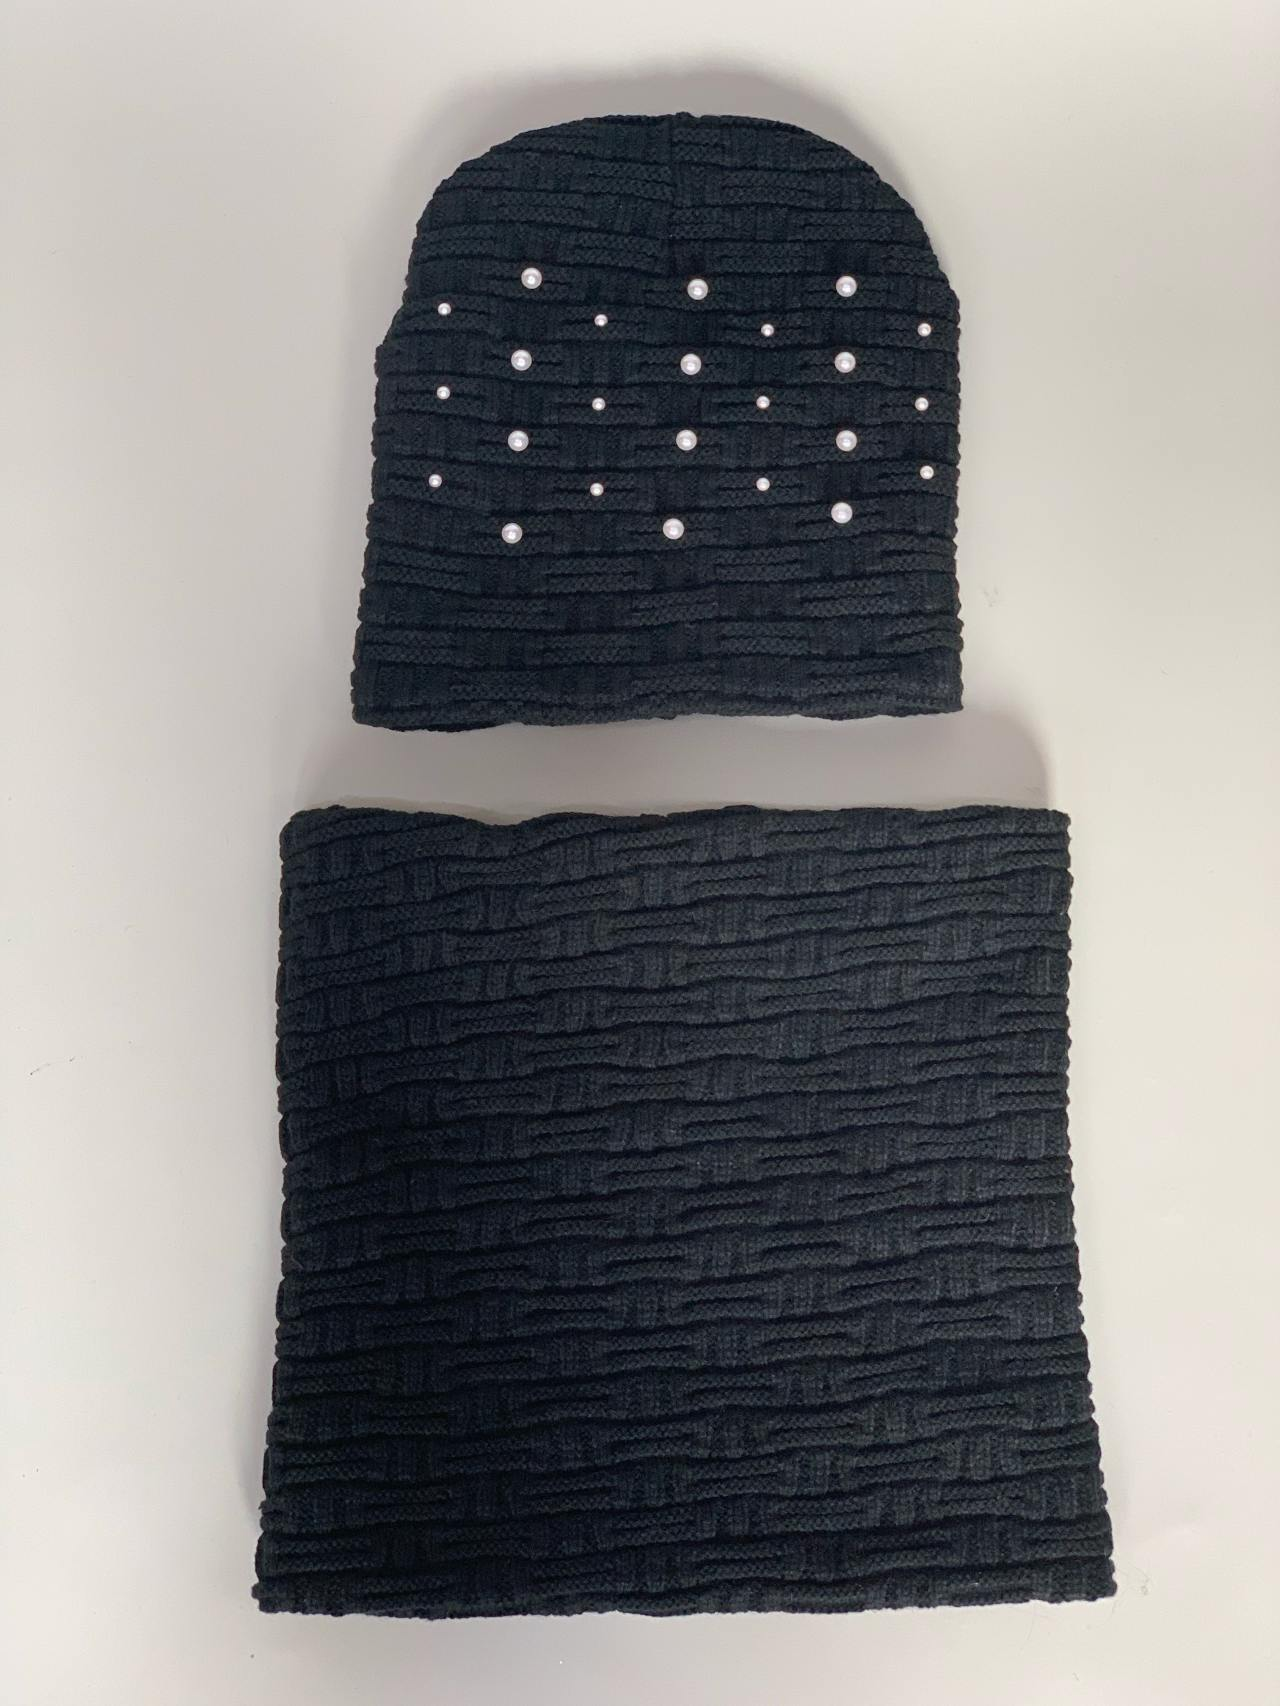 Komplet čepice a nákrčník s perličkami černý -03